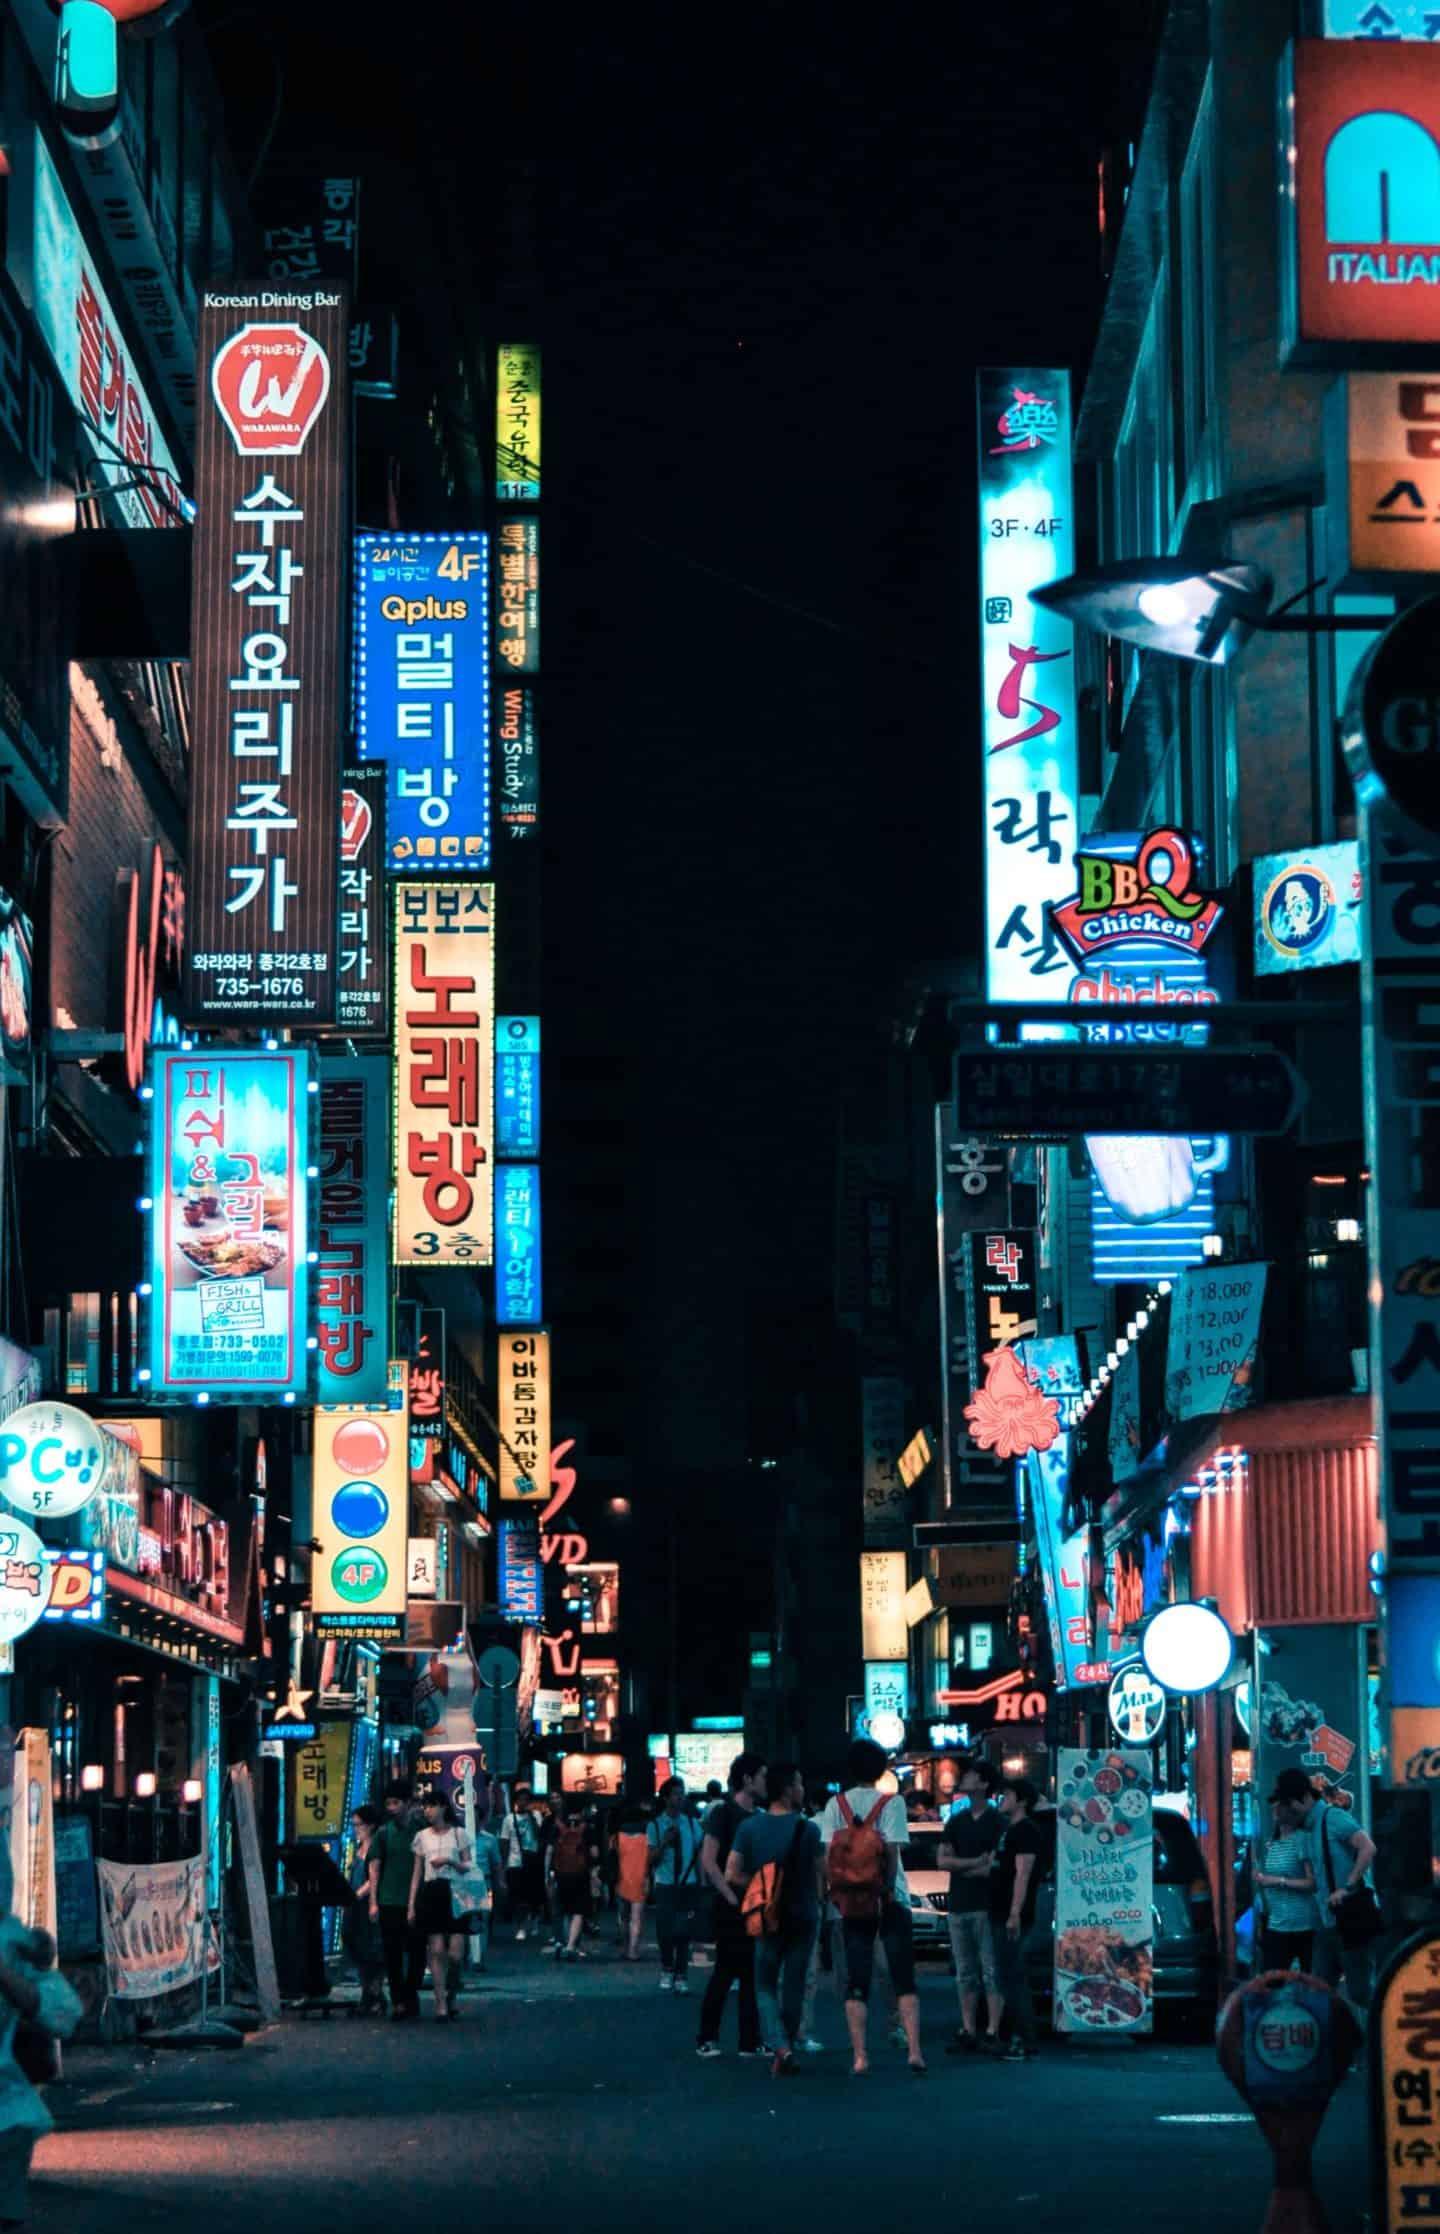 Seoul,black expat friendly city